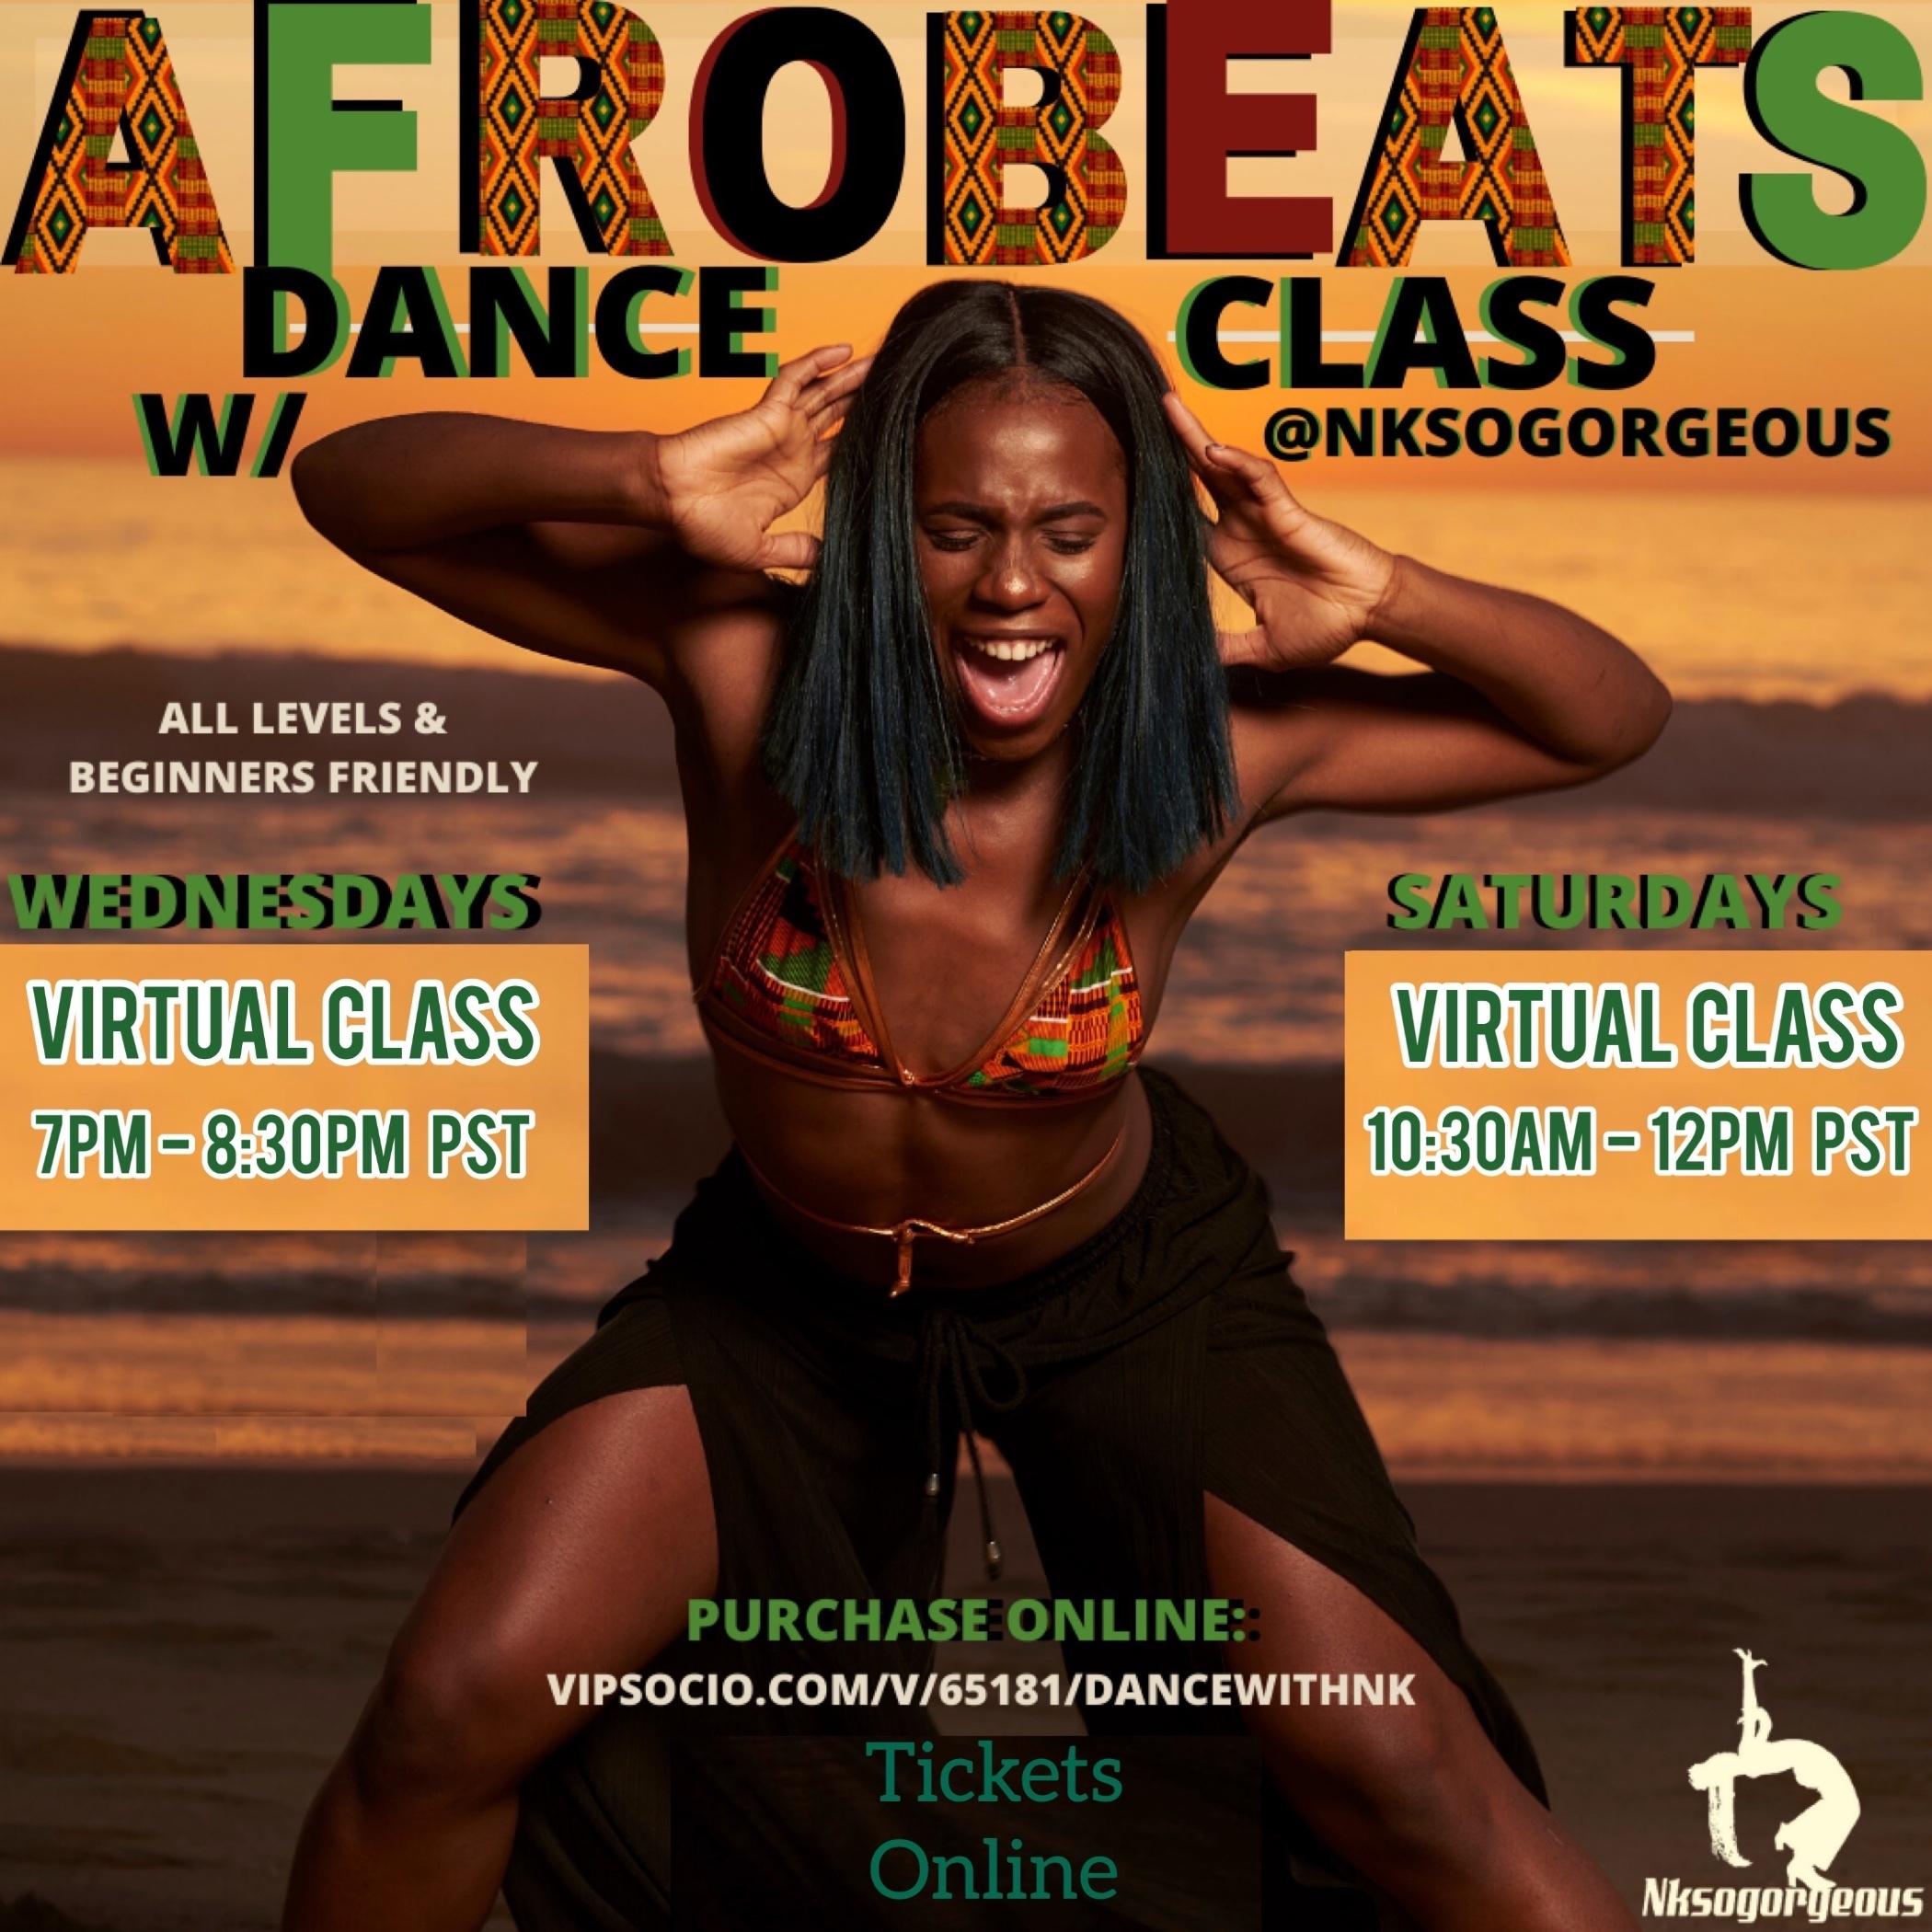 Afrobeat Saturday Dance Class w/ Nk - Virtual